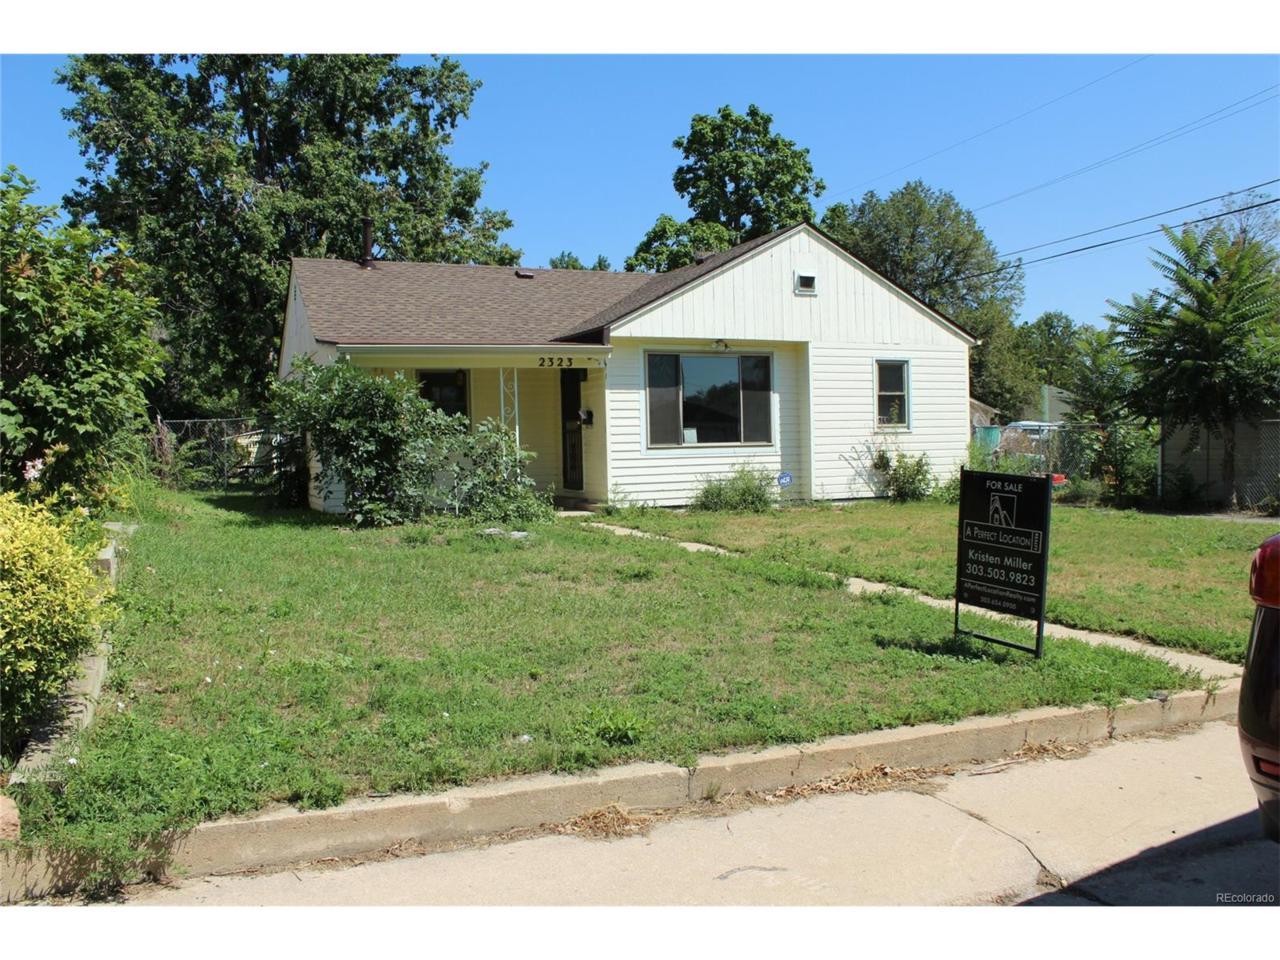 2323 W 47th Avenue, Denver, CO 80211 (MLS #5690300) :: 8z Real Estate